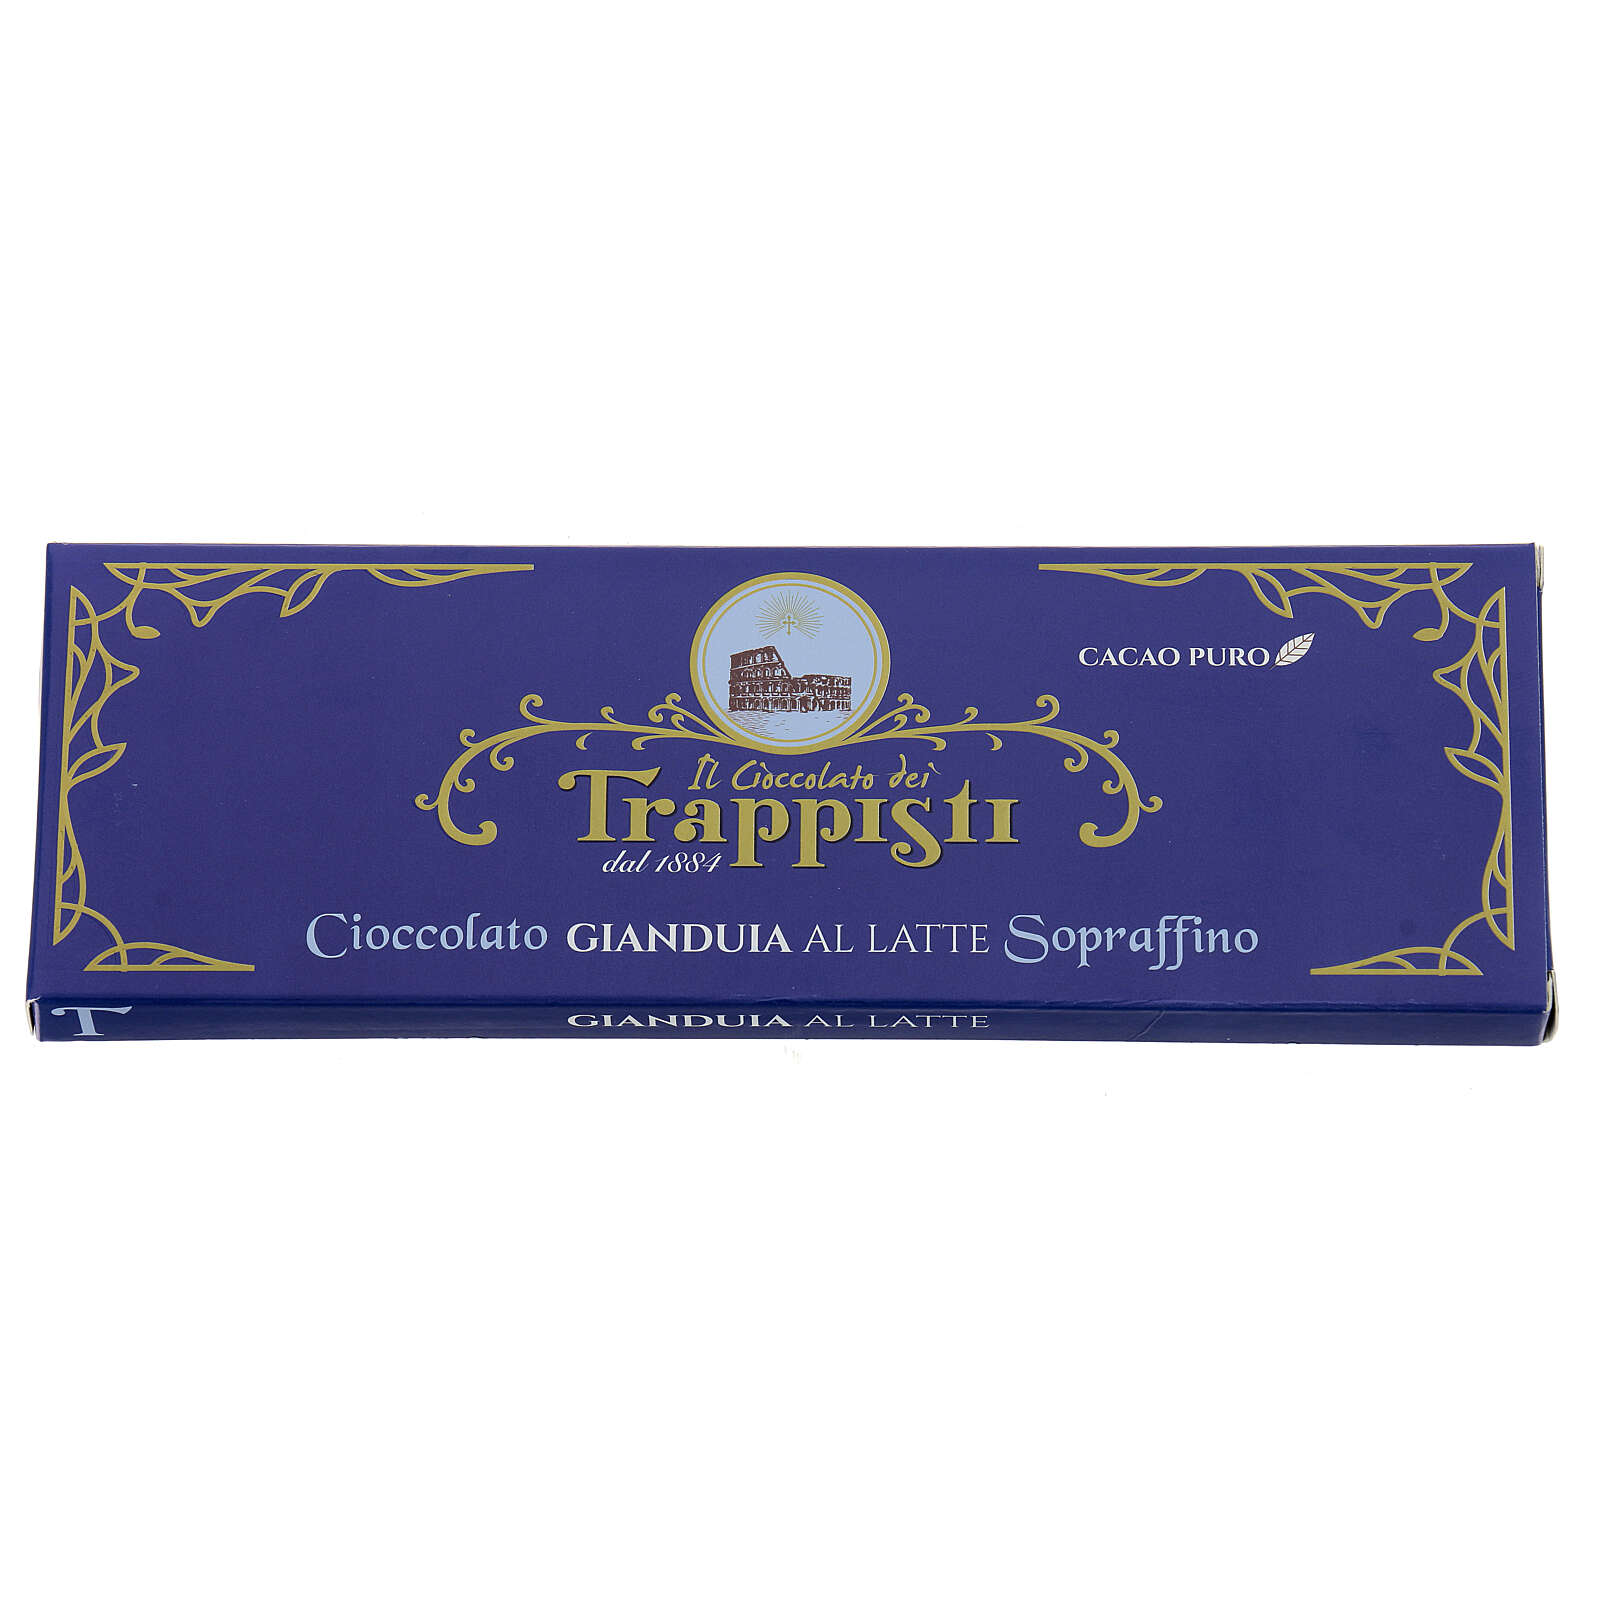 Soft nut chocolate 150gr- Frattocchie Trappist monastery 3